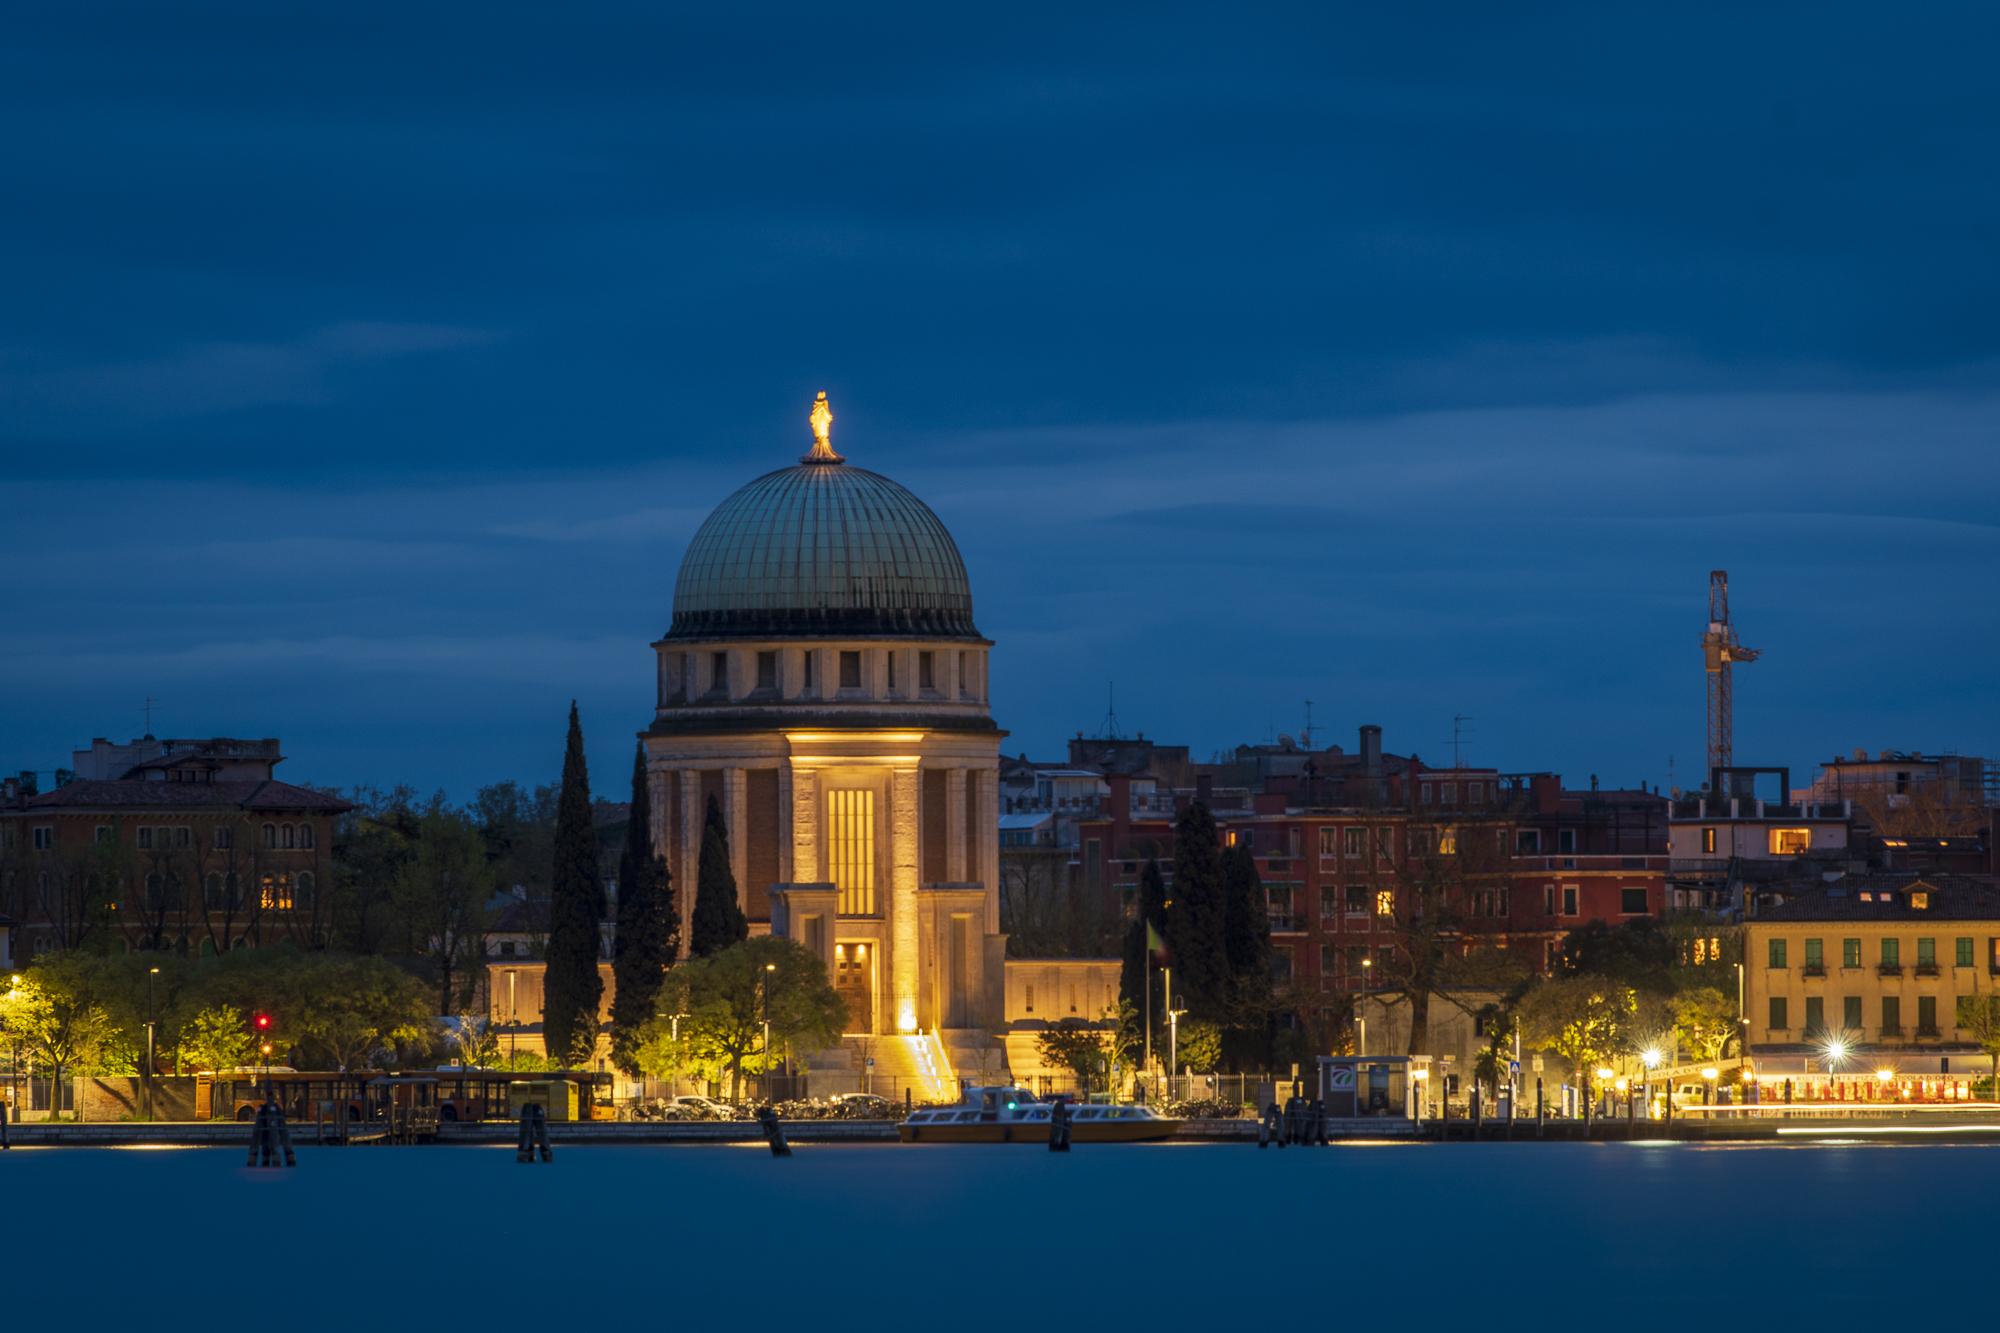 Lido di Venezia  PHOTOGRAPHY: ALEXANDER J.E. BRADLEY • NIKON D500 • AF-S NIKKOR 70-200mm ƒ/2.8 FL ED VR @ 200MM • Ƒ/8 • 15 SEC • ISO 100